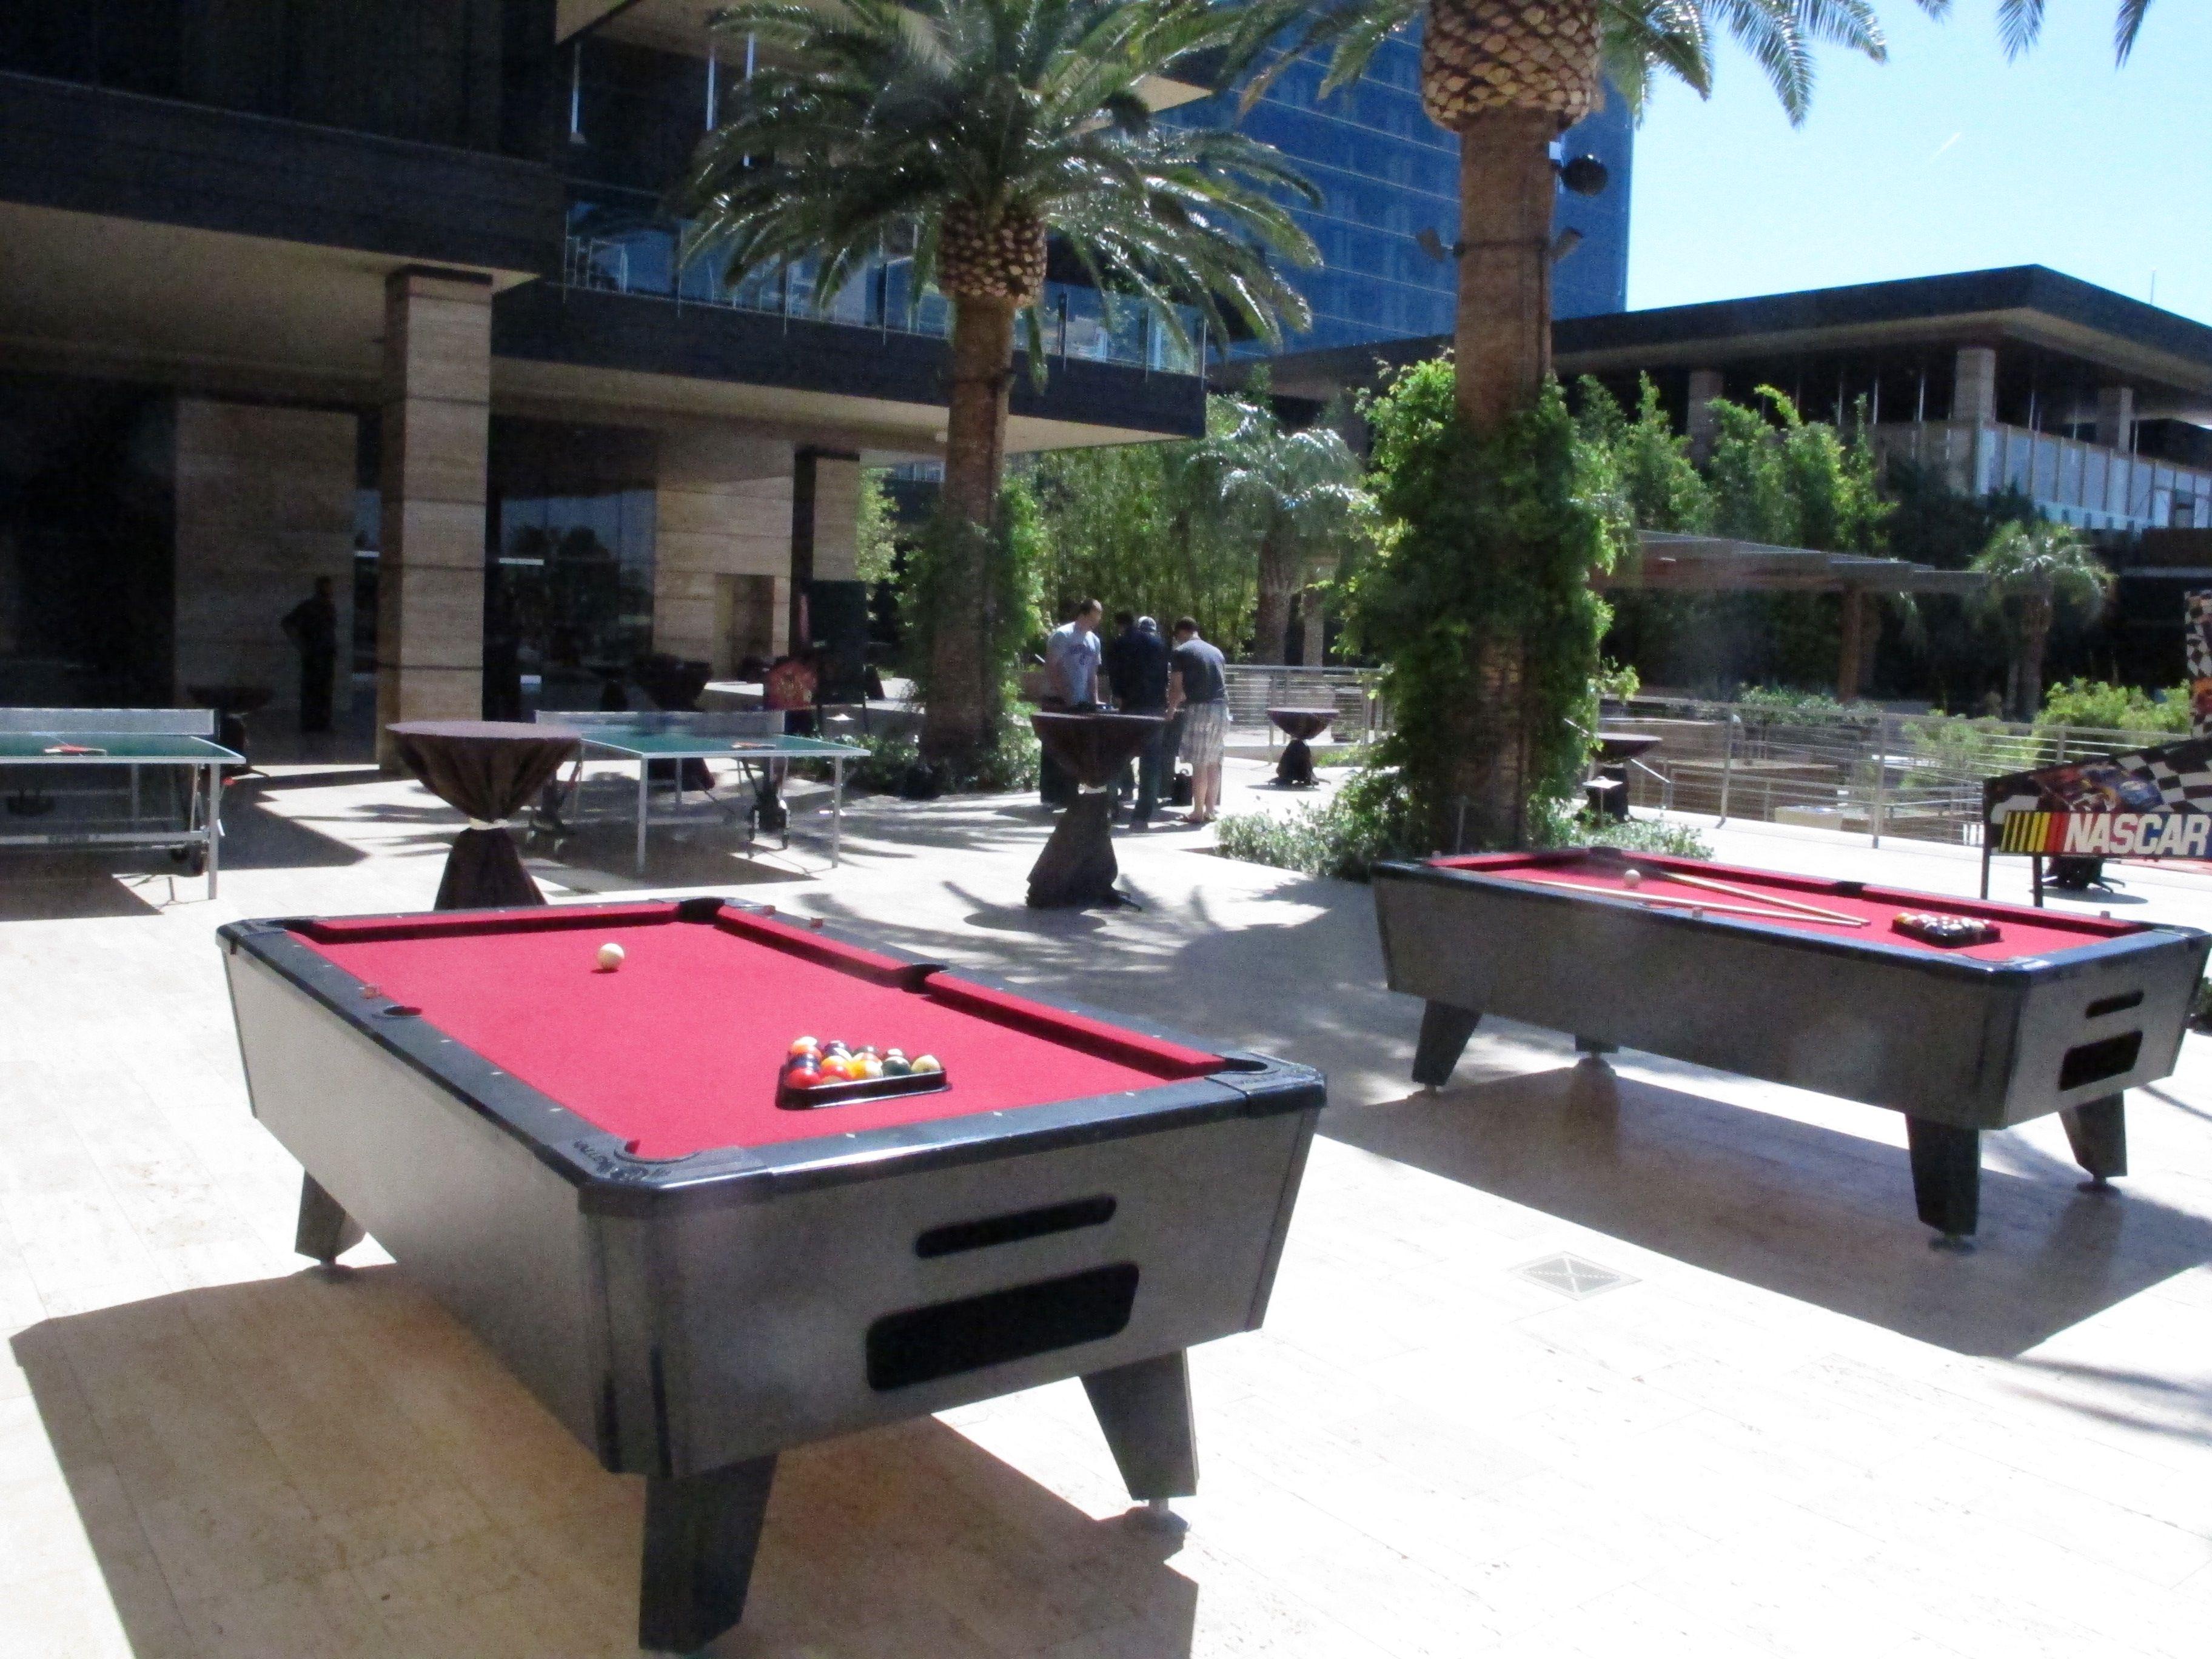 A fun outdoor gaming lounge at the M Resort pool in Las Vegas